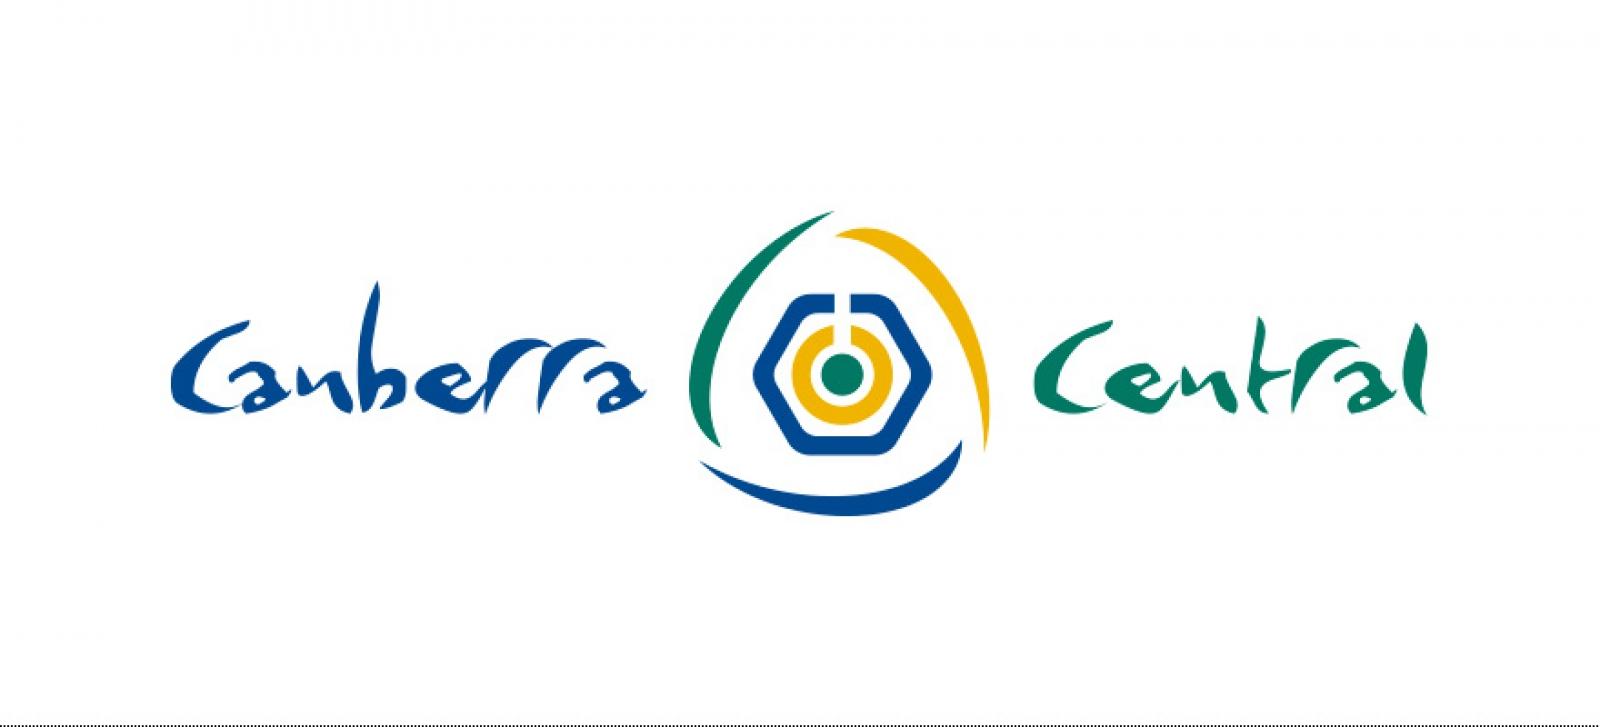 CanberraCentral